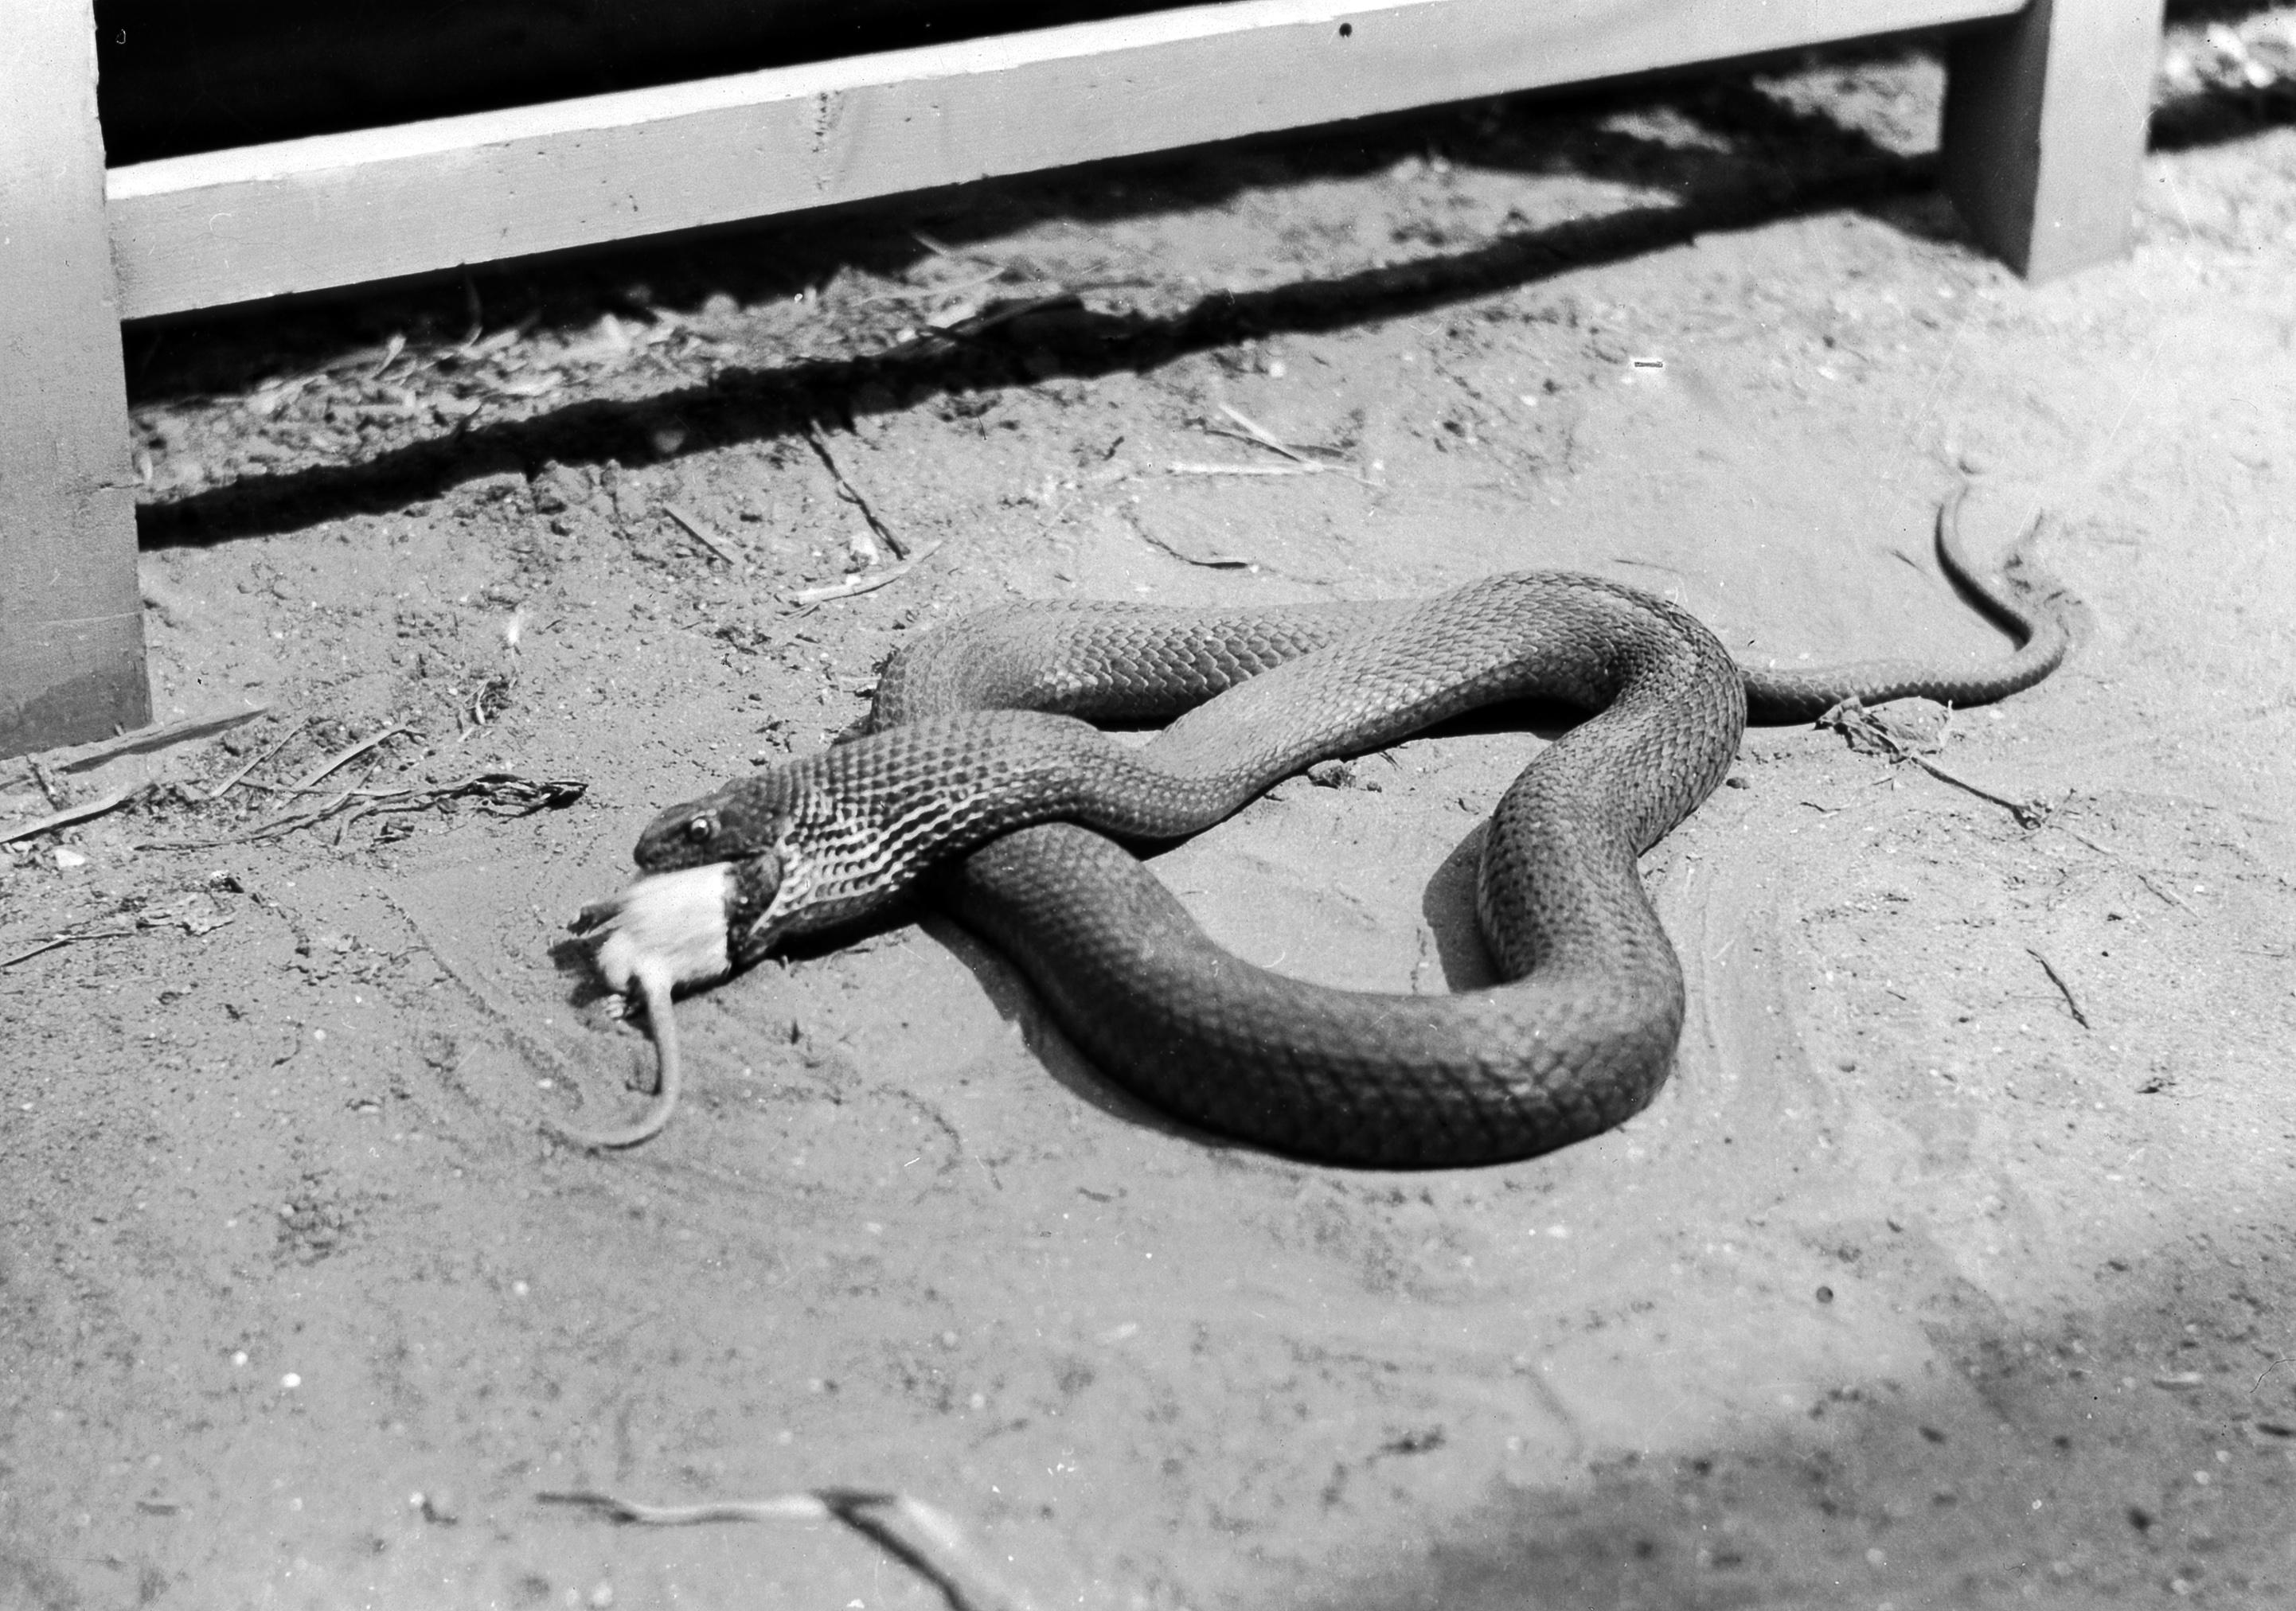 File:Snake eating mouse.jpg - Wikimedia Commons - photo#6